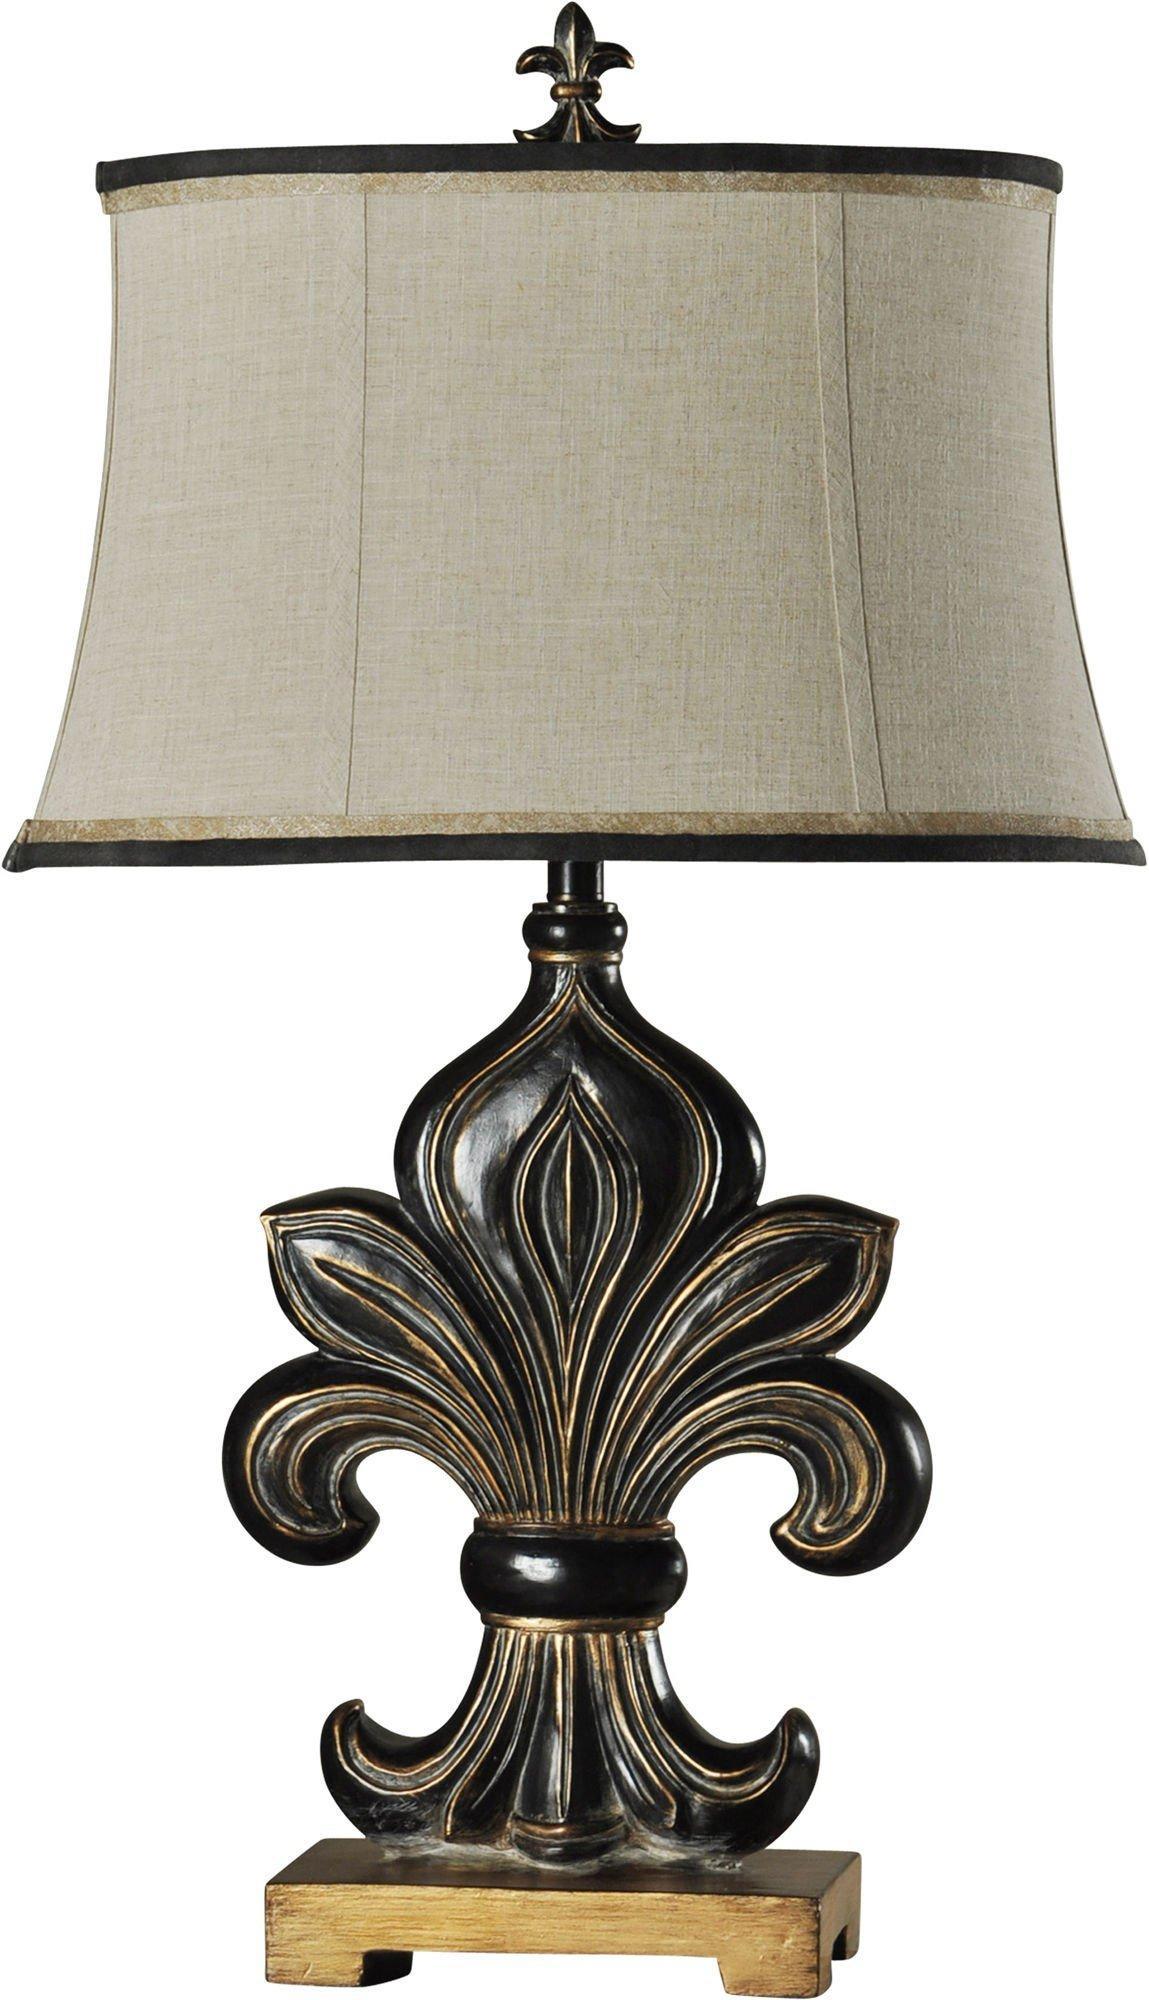 StyleCraft Fleur De Lis Motif Table Lamp